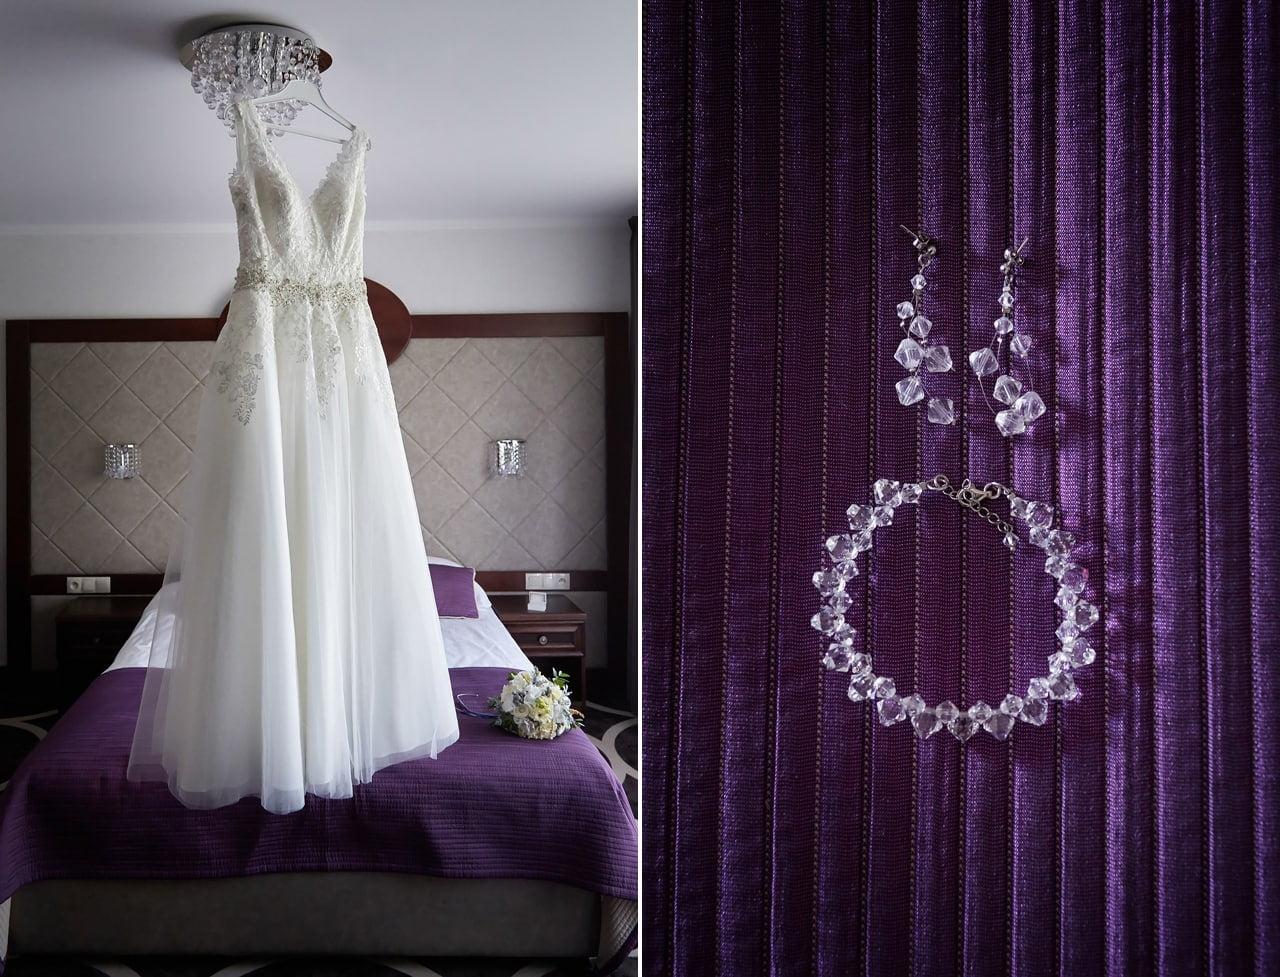 Hotel Evita - Złota Polska Jesień w Tleniu 01404 hotel evita 11